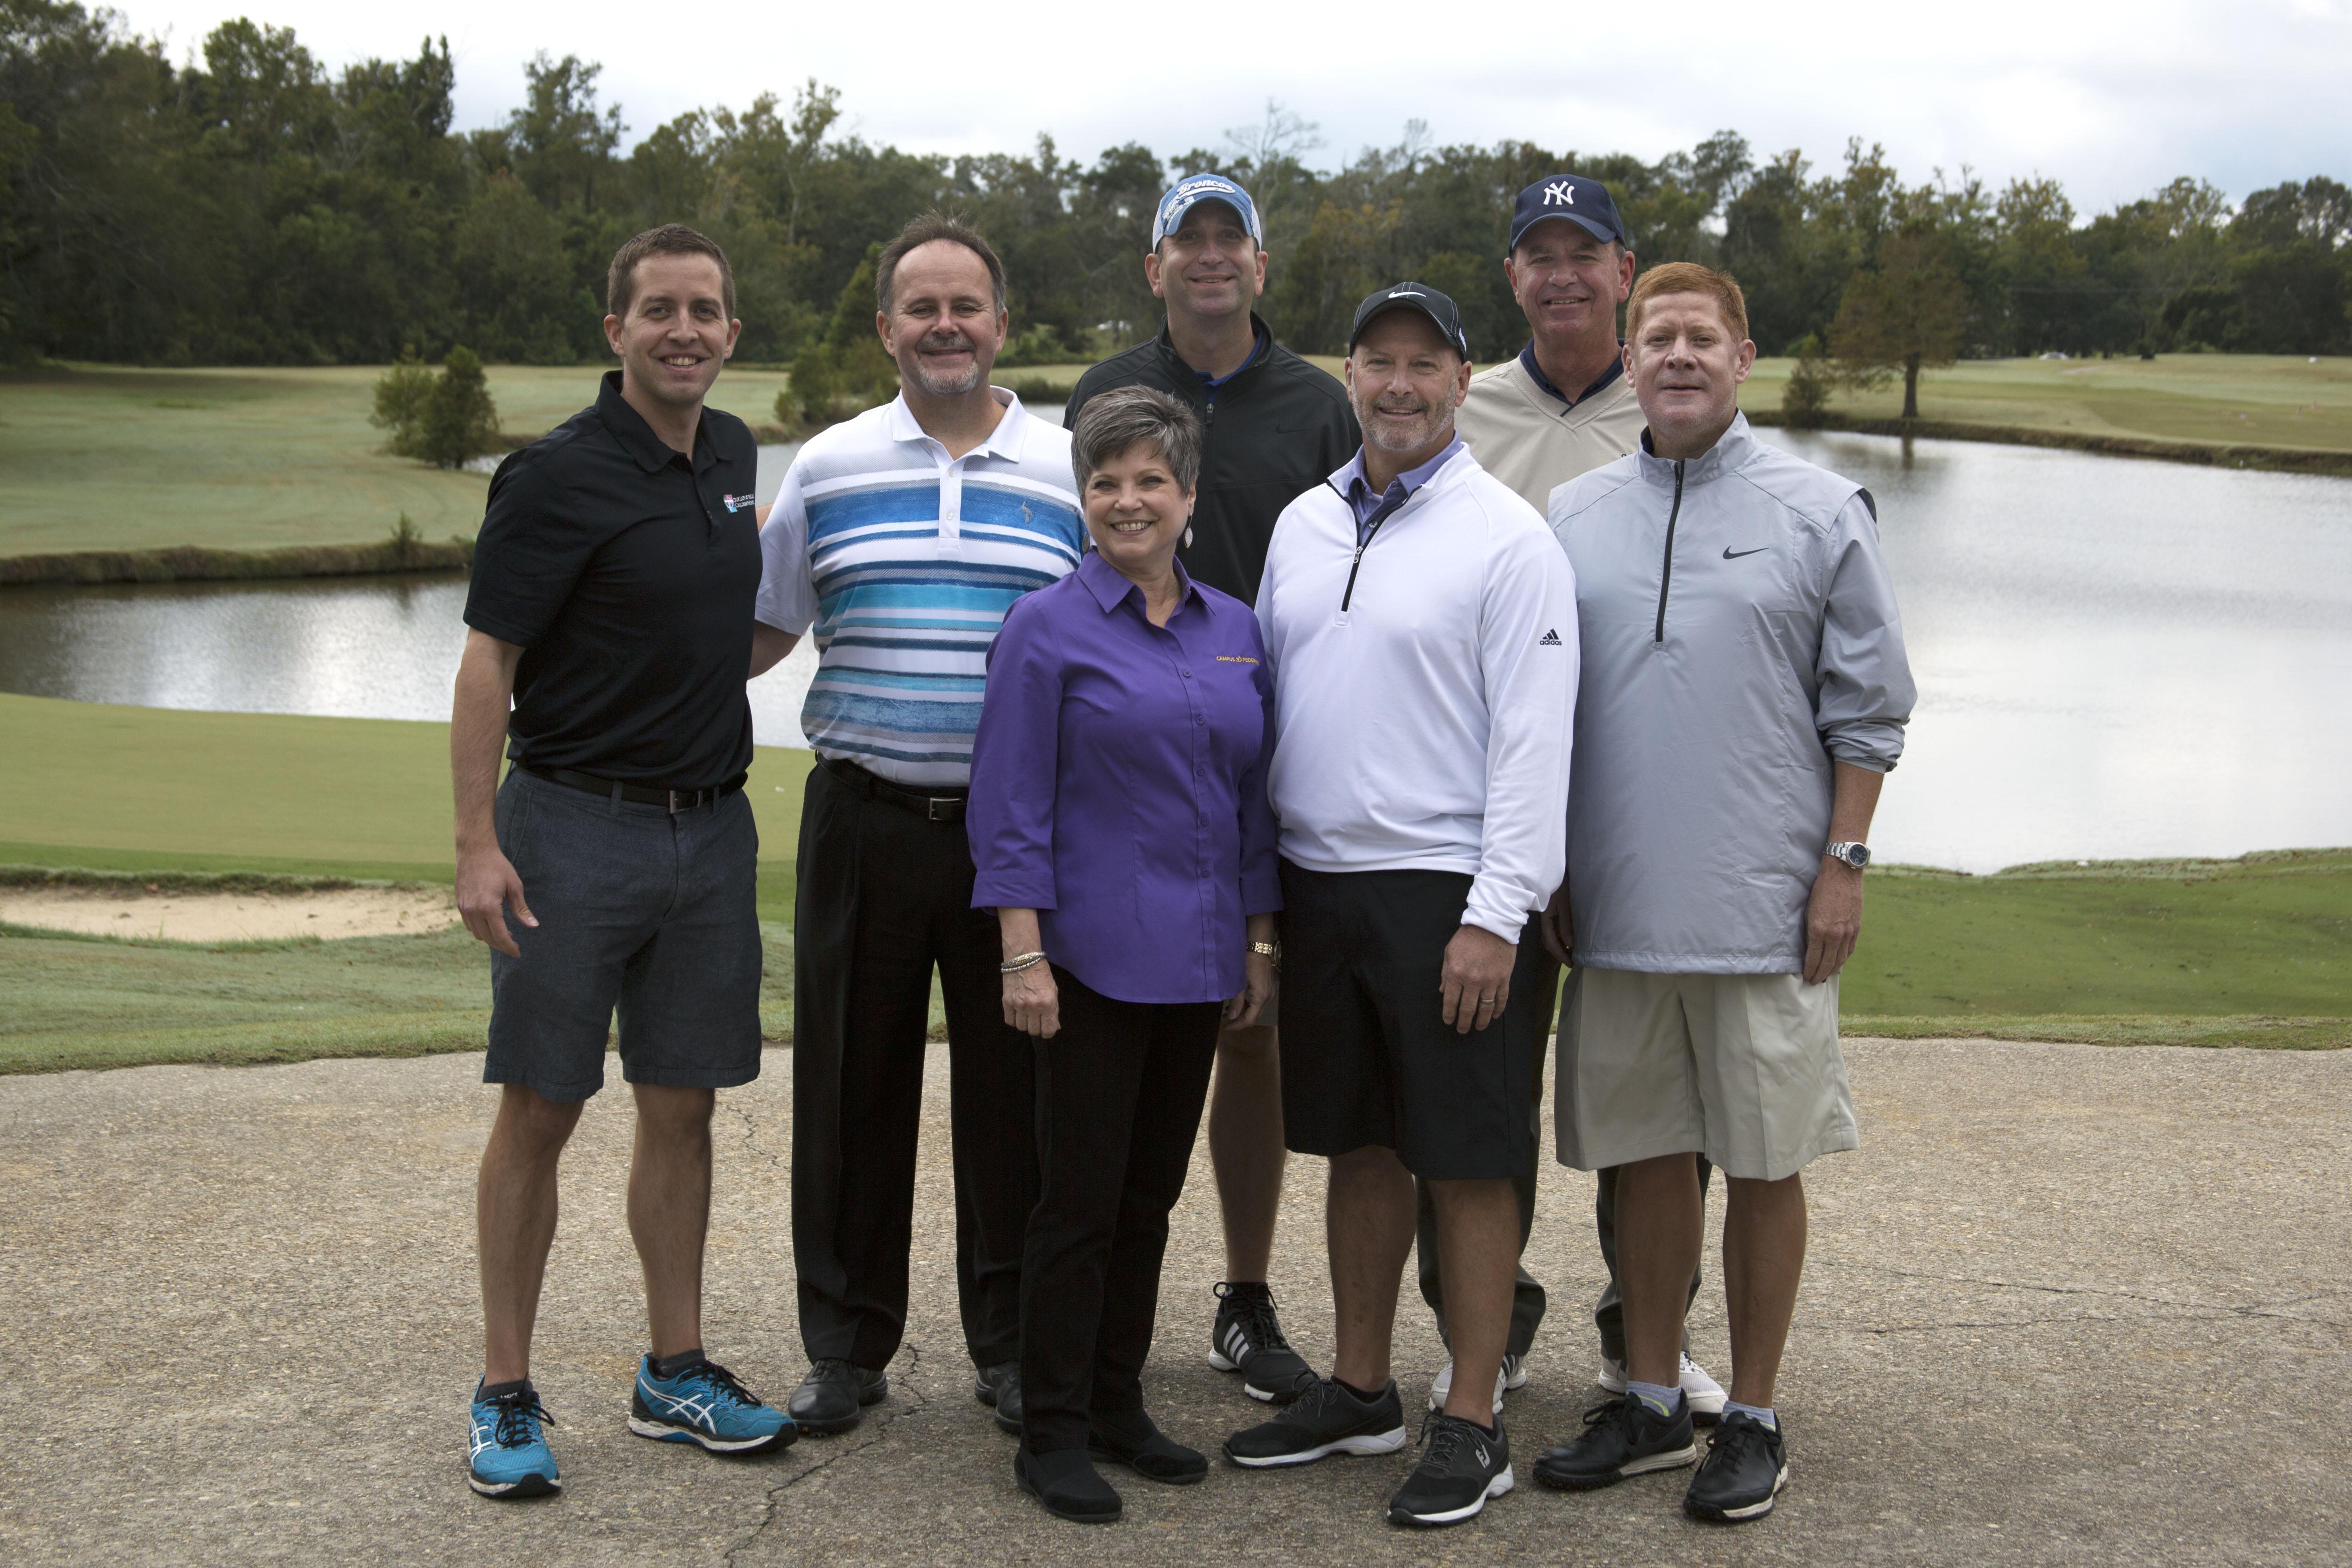 Enterprise Car Sales Canada >> Charity Golf Tournament raises $39k for children's hospital - CUInsight